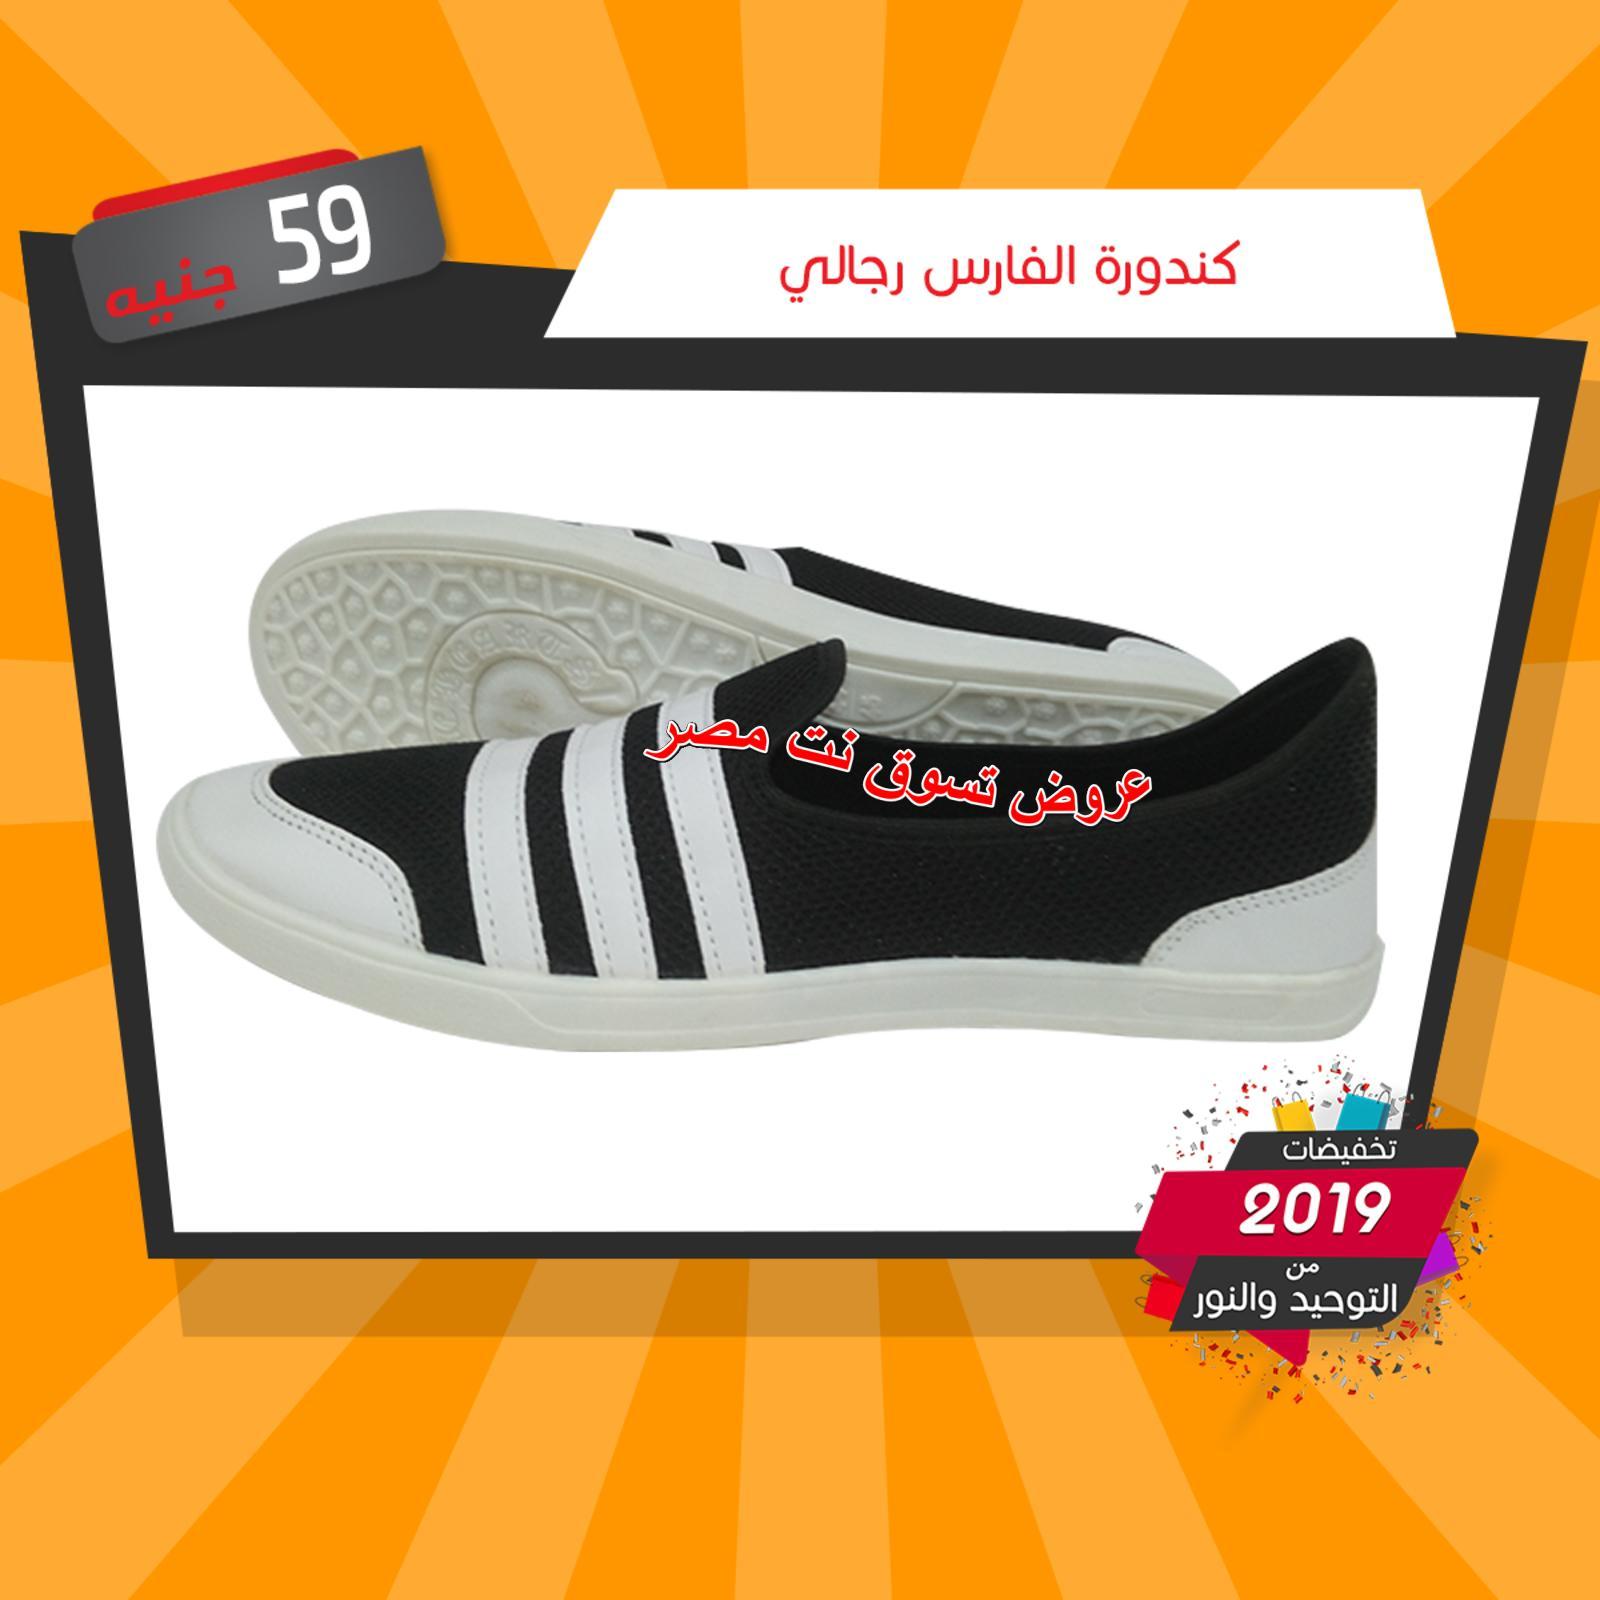 27bd2e231 عروض التوحيد والنور مصر على الاحذية من 5-3-2019 | تسوق نت